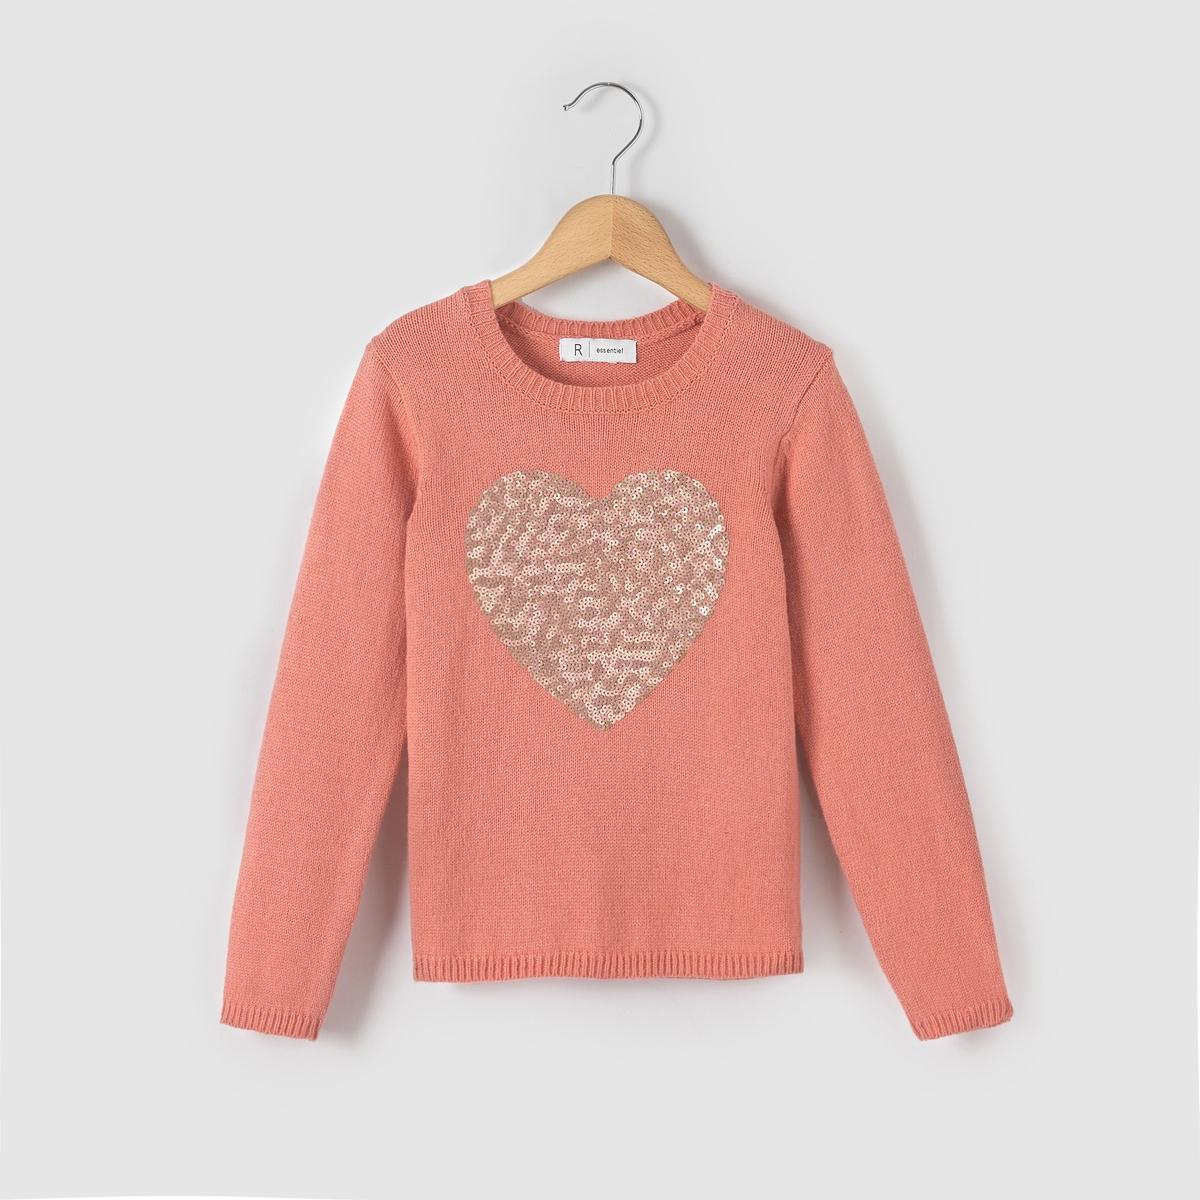 Пуловер сердце из пайеток,  3-12 лет